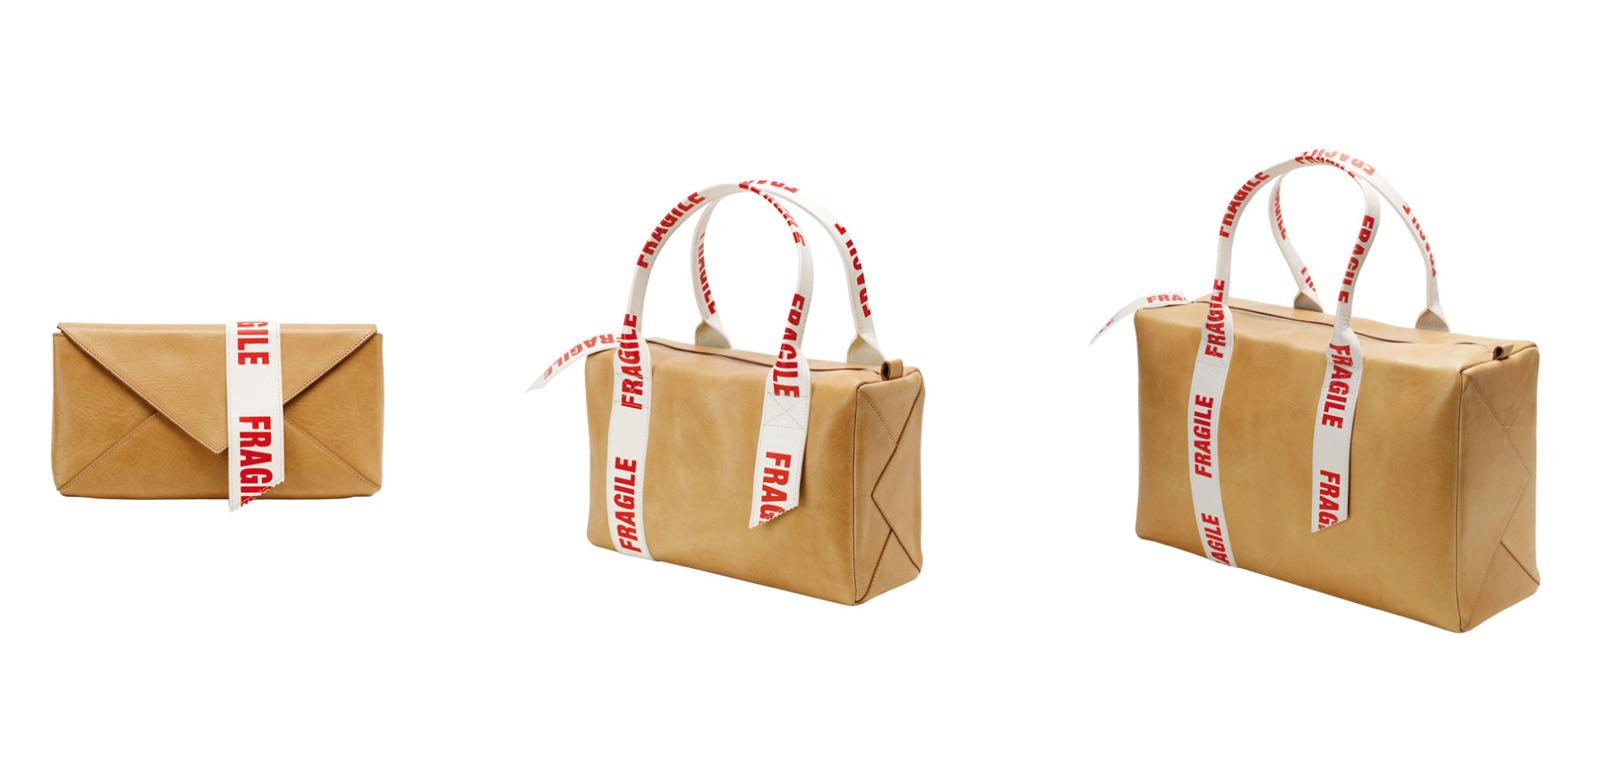 Varianten der Parcelbag von Pia Pasalks Label Content & Container.